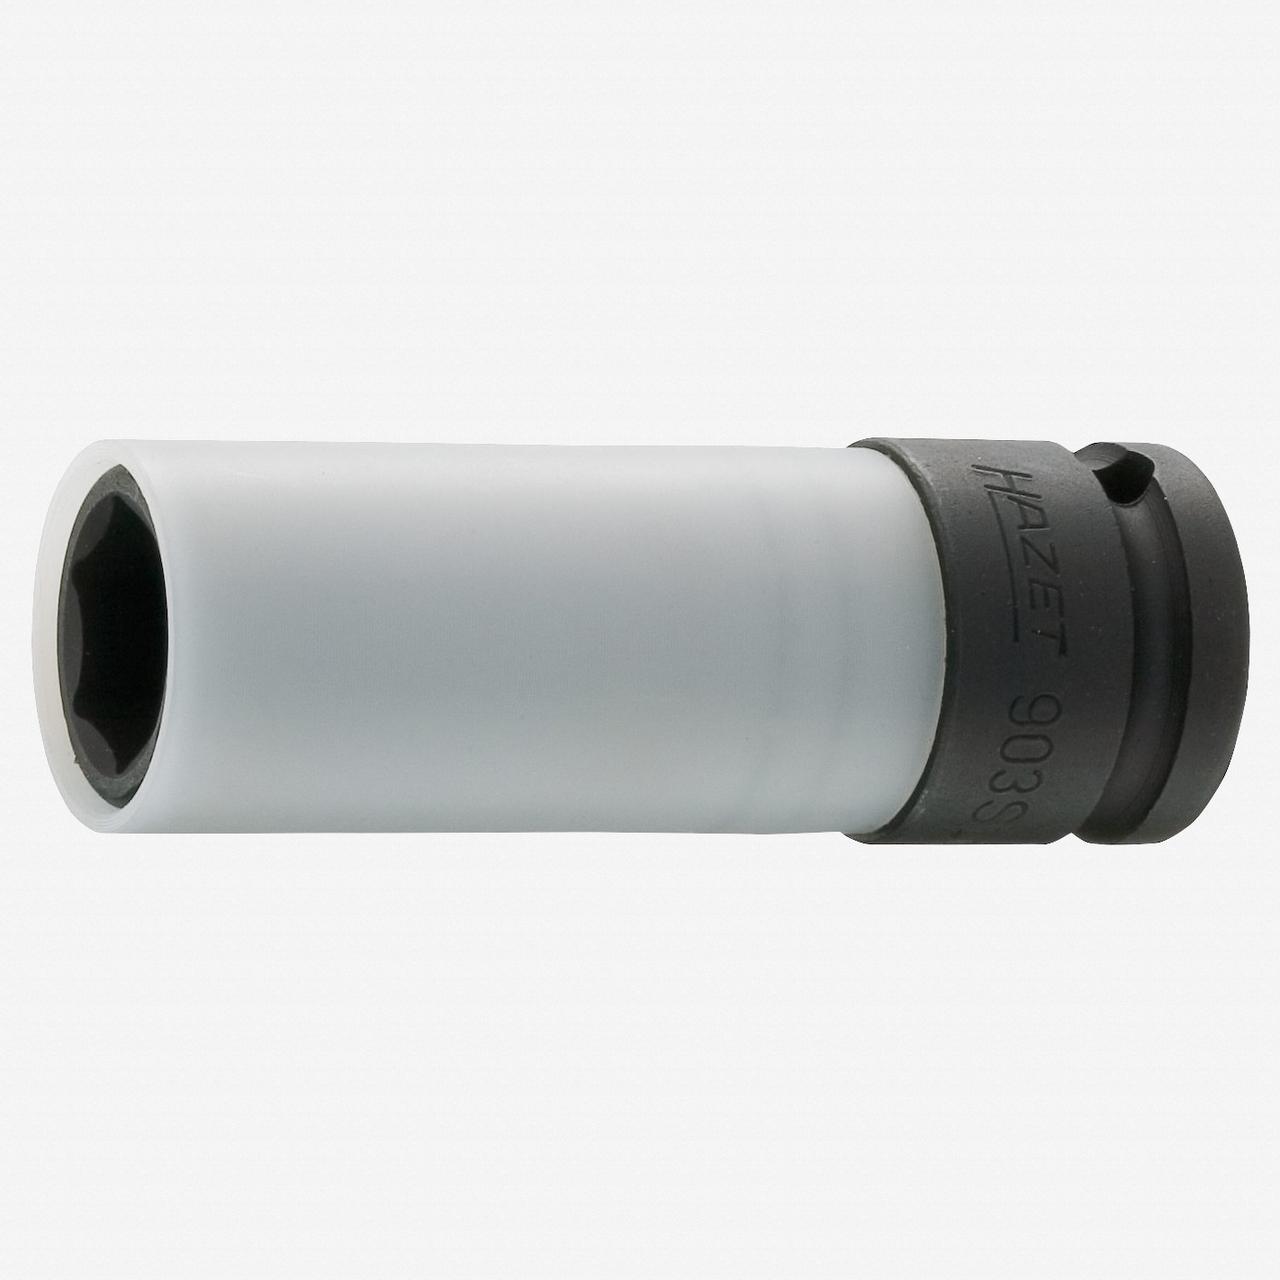 "Hazet 903SLG-15 15mm x 1/2"" Lug Nut Impact Socket with Plastic Sleeve  - KC Tool"